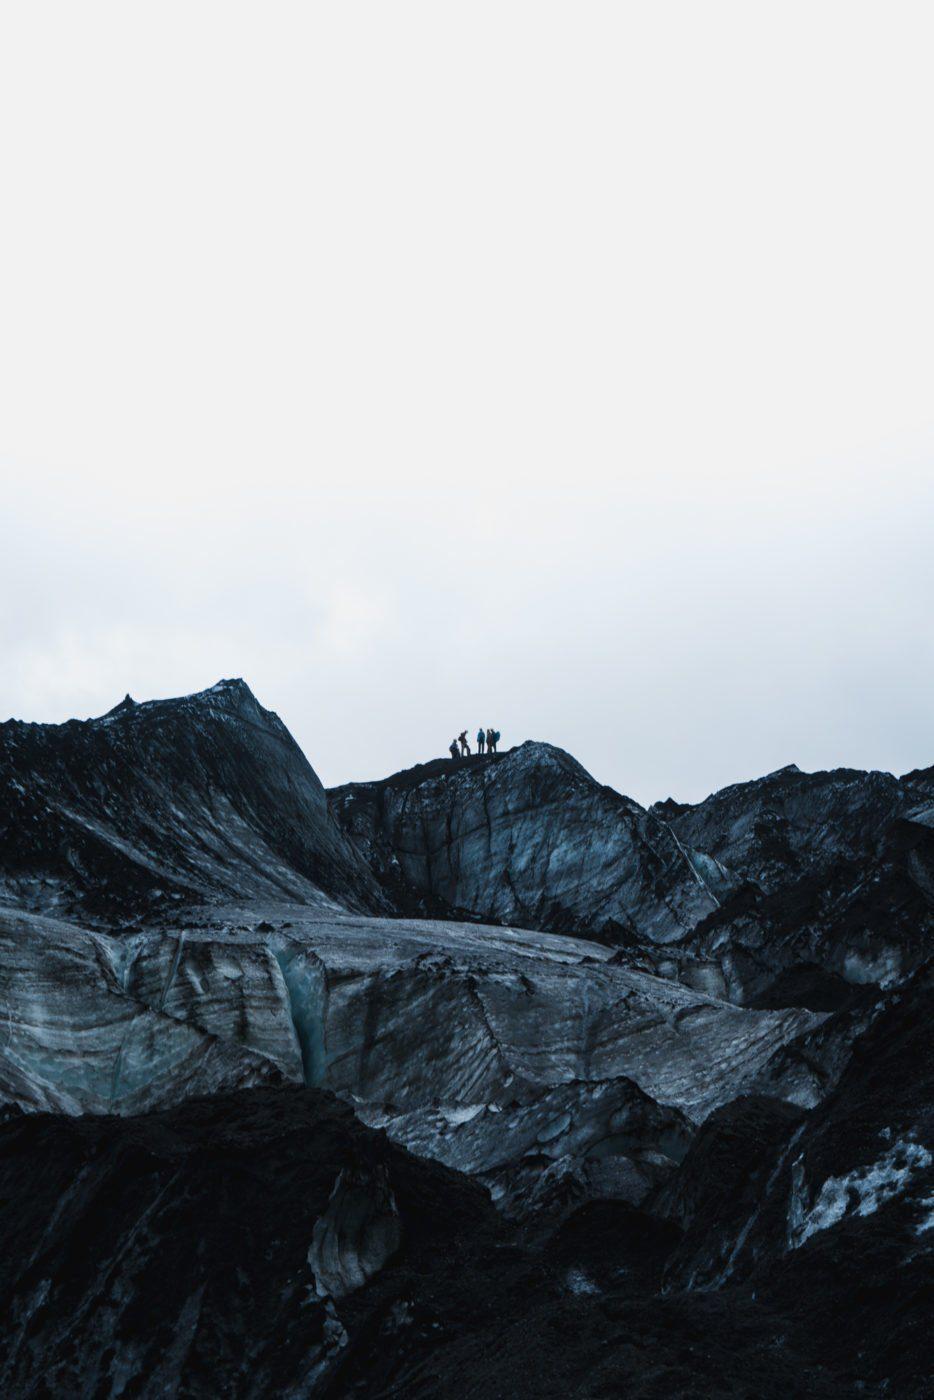 On top of Solheimajökull